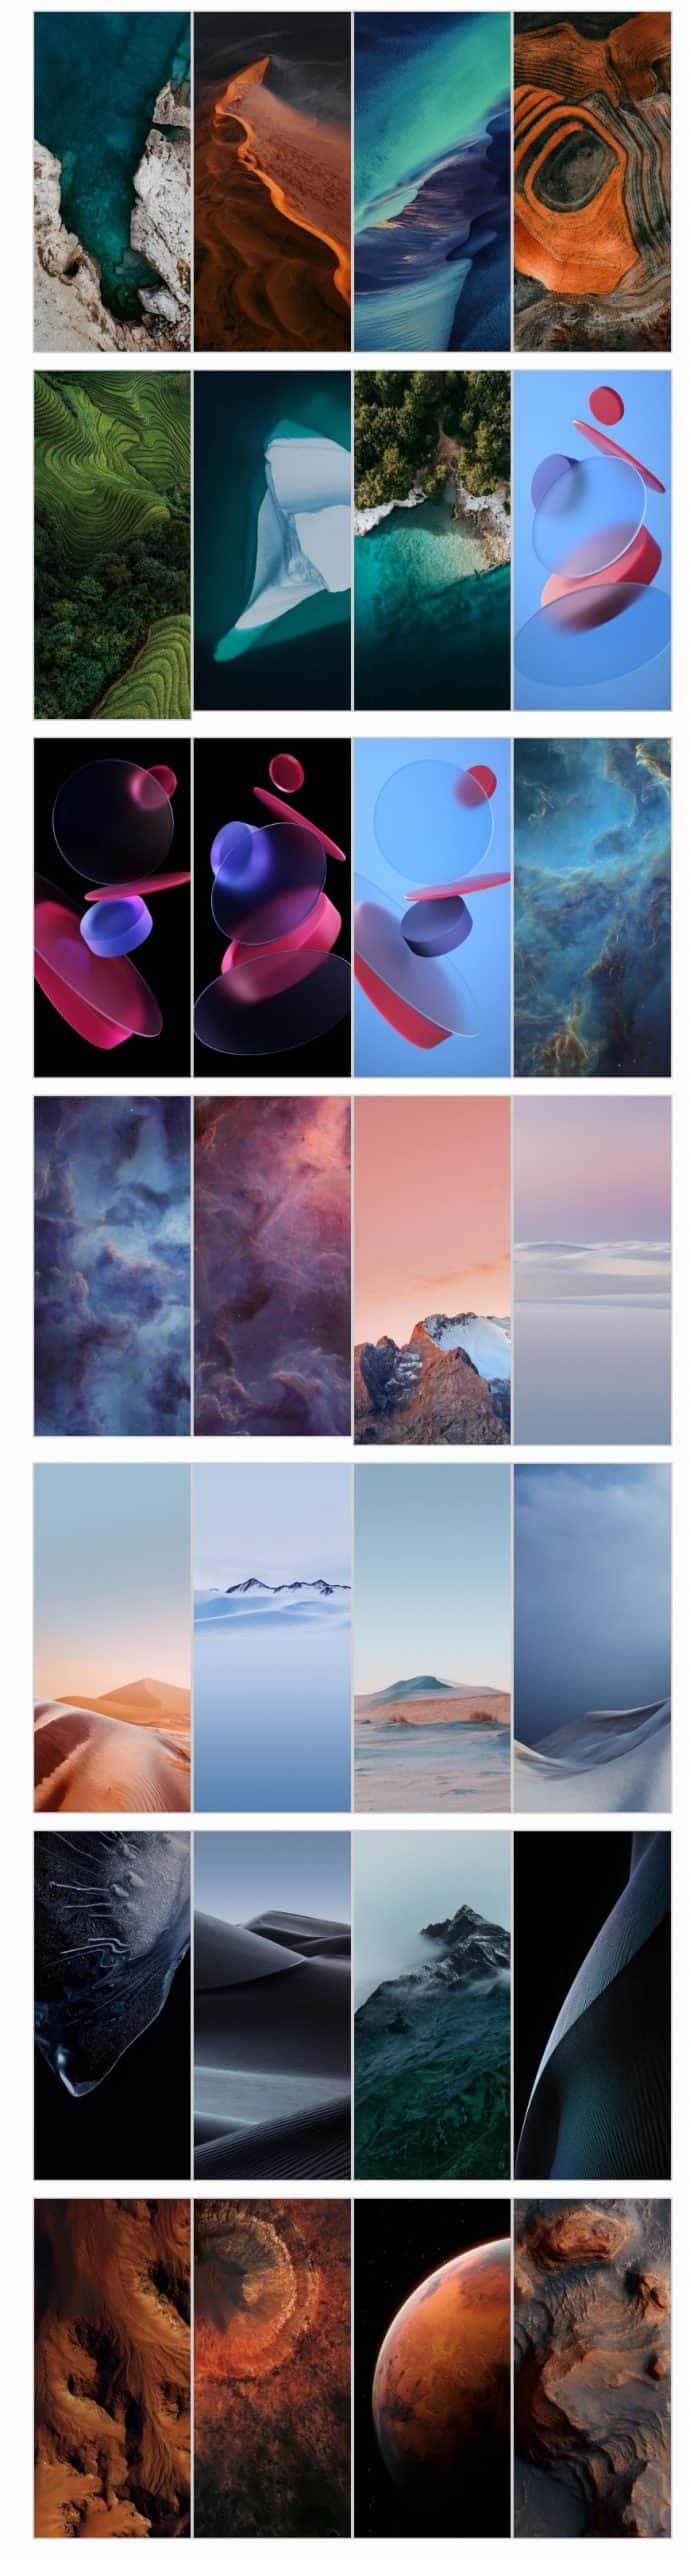 miui 12 wallpapers